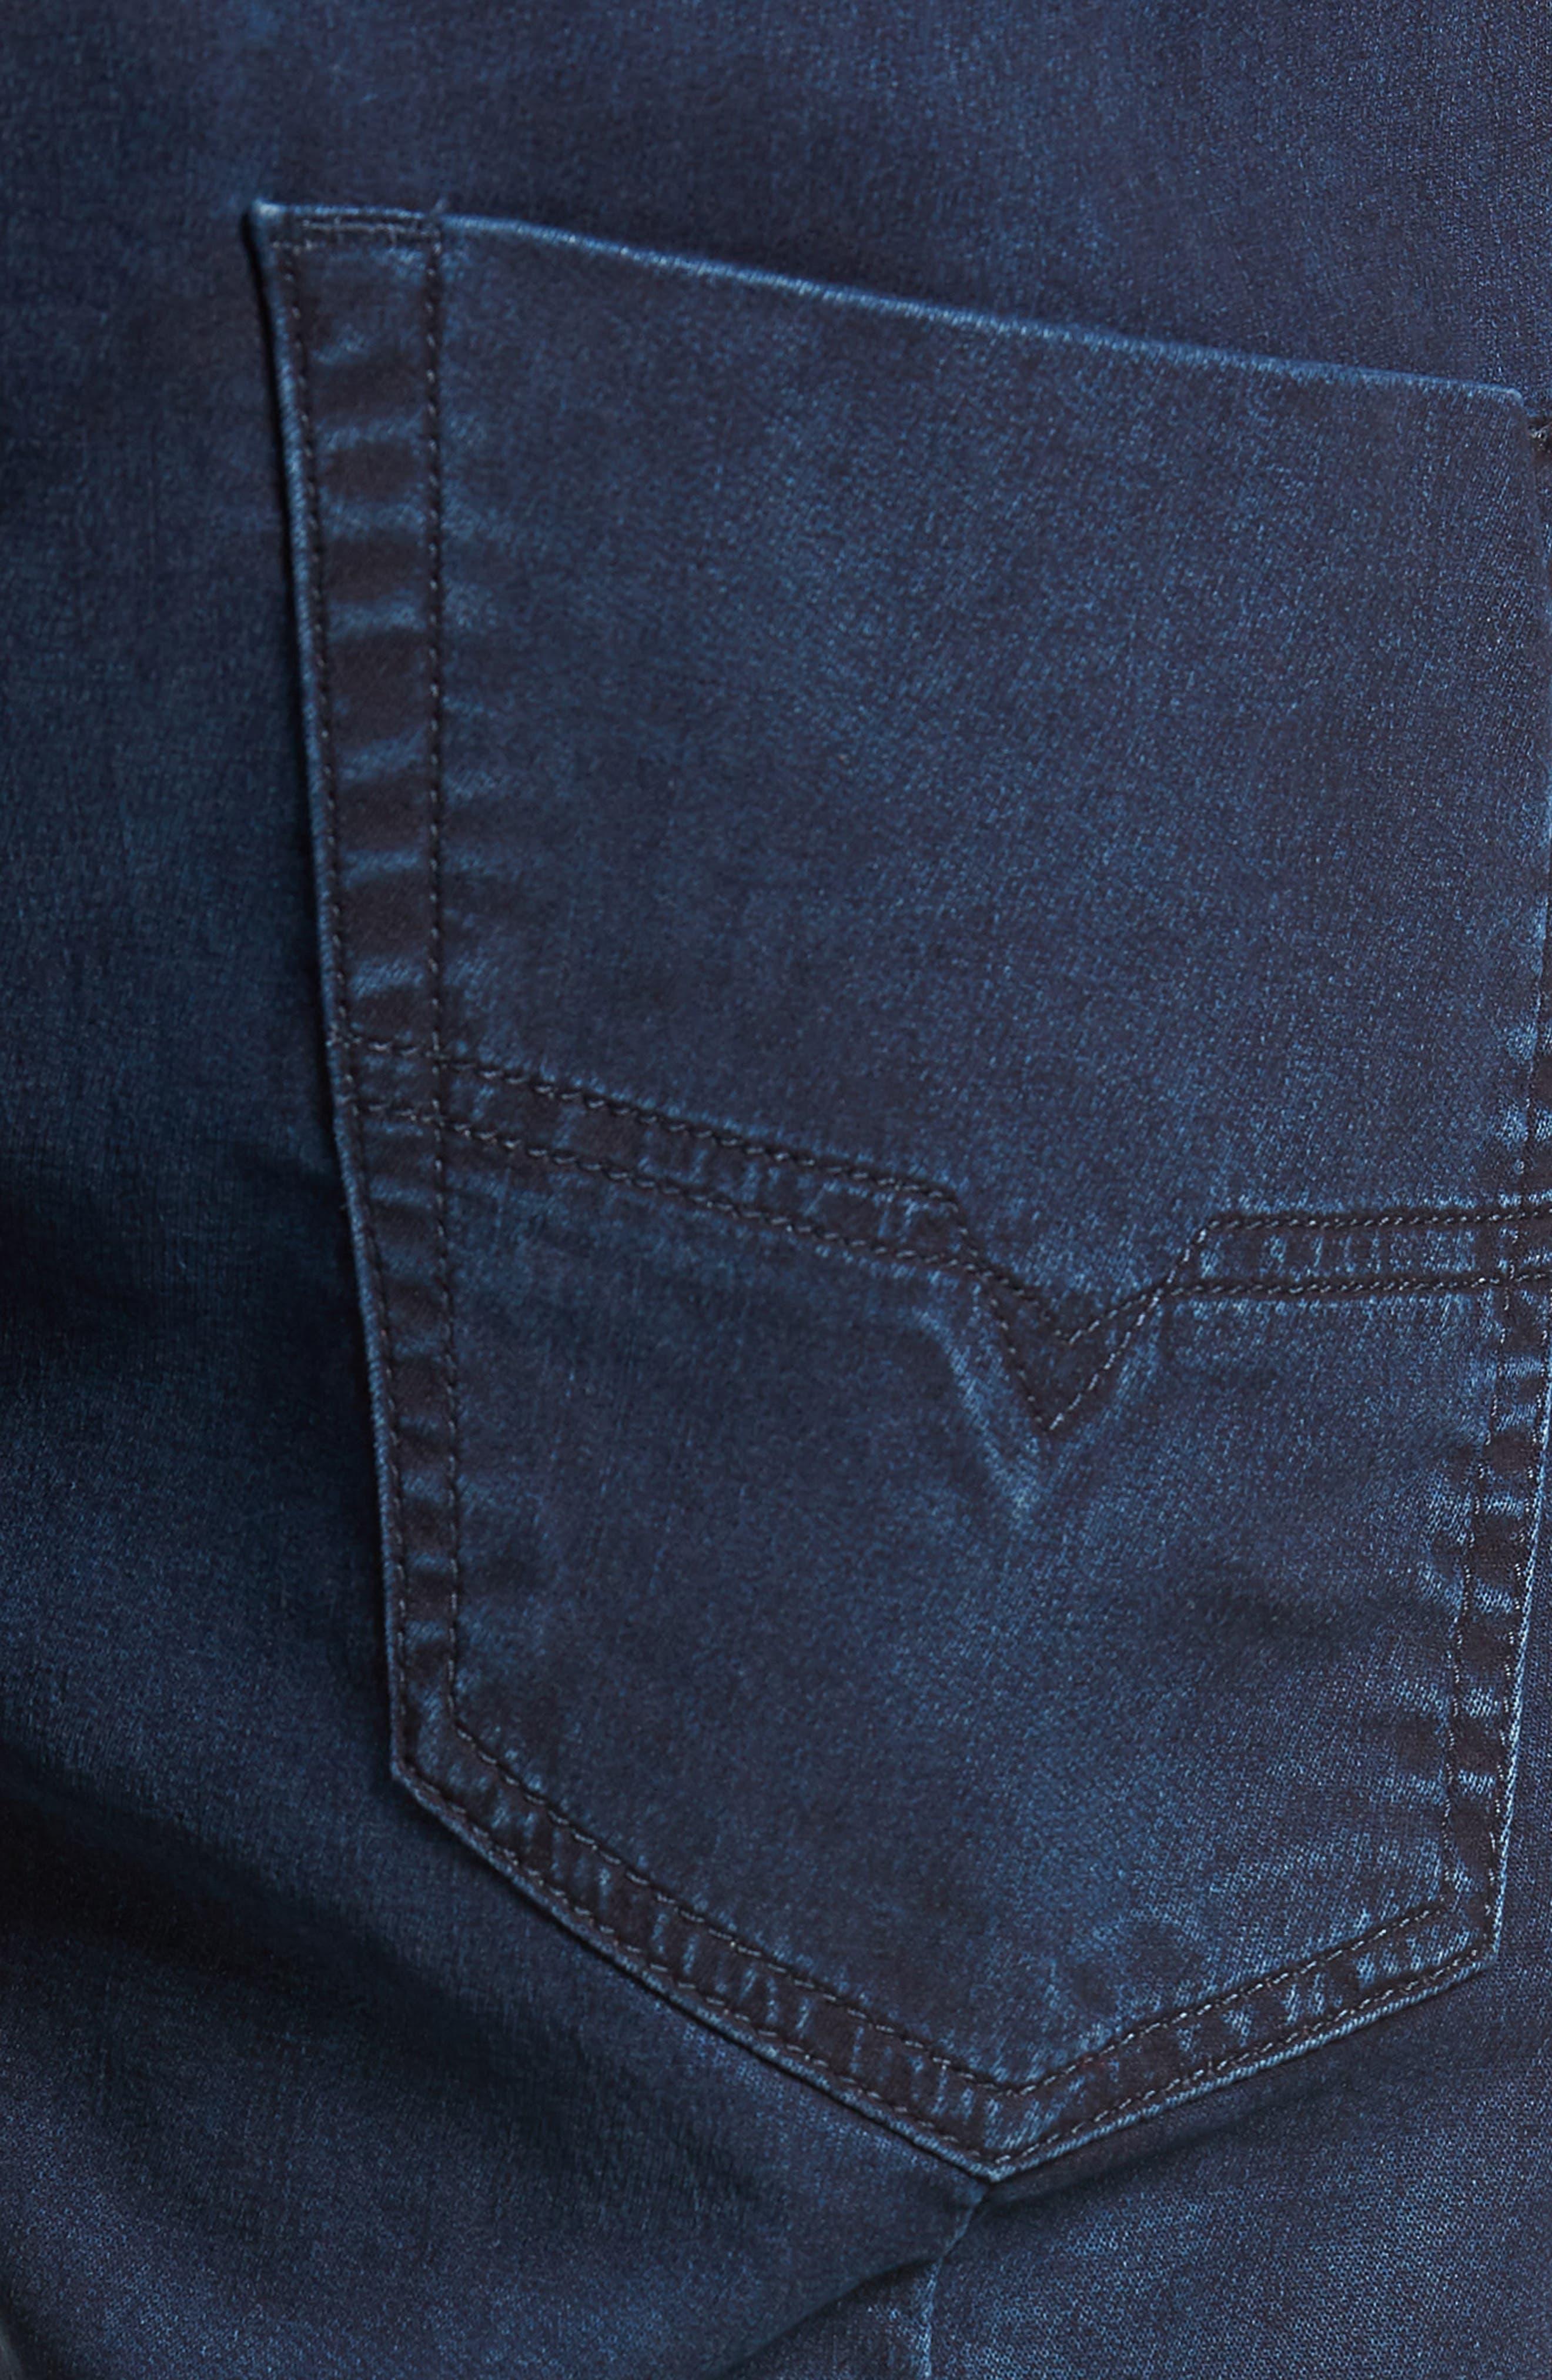 DIESEL<SUP>®</SUP>, Krooshort Denim Shorts, Alternate thumbnail 5, color, 400